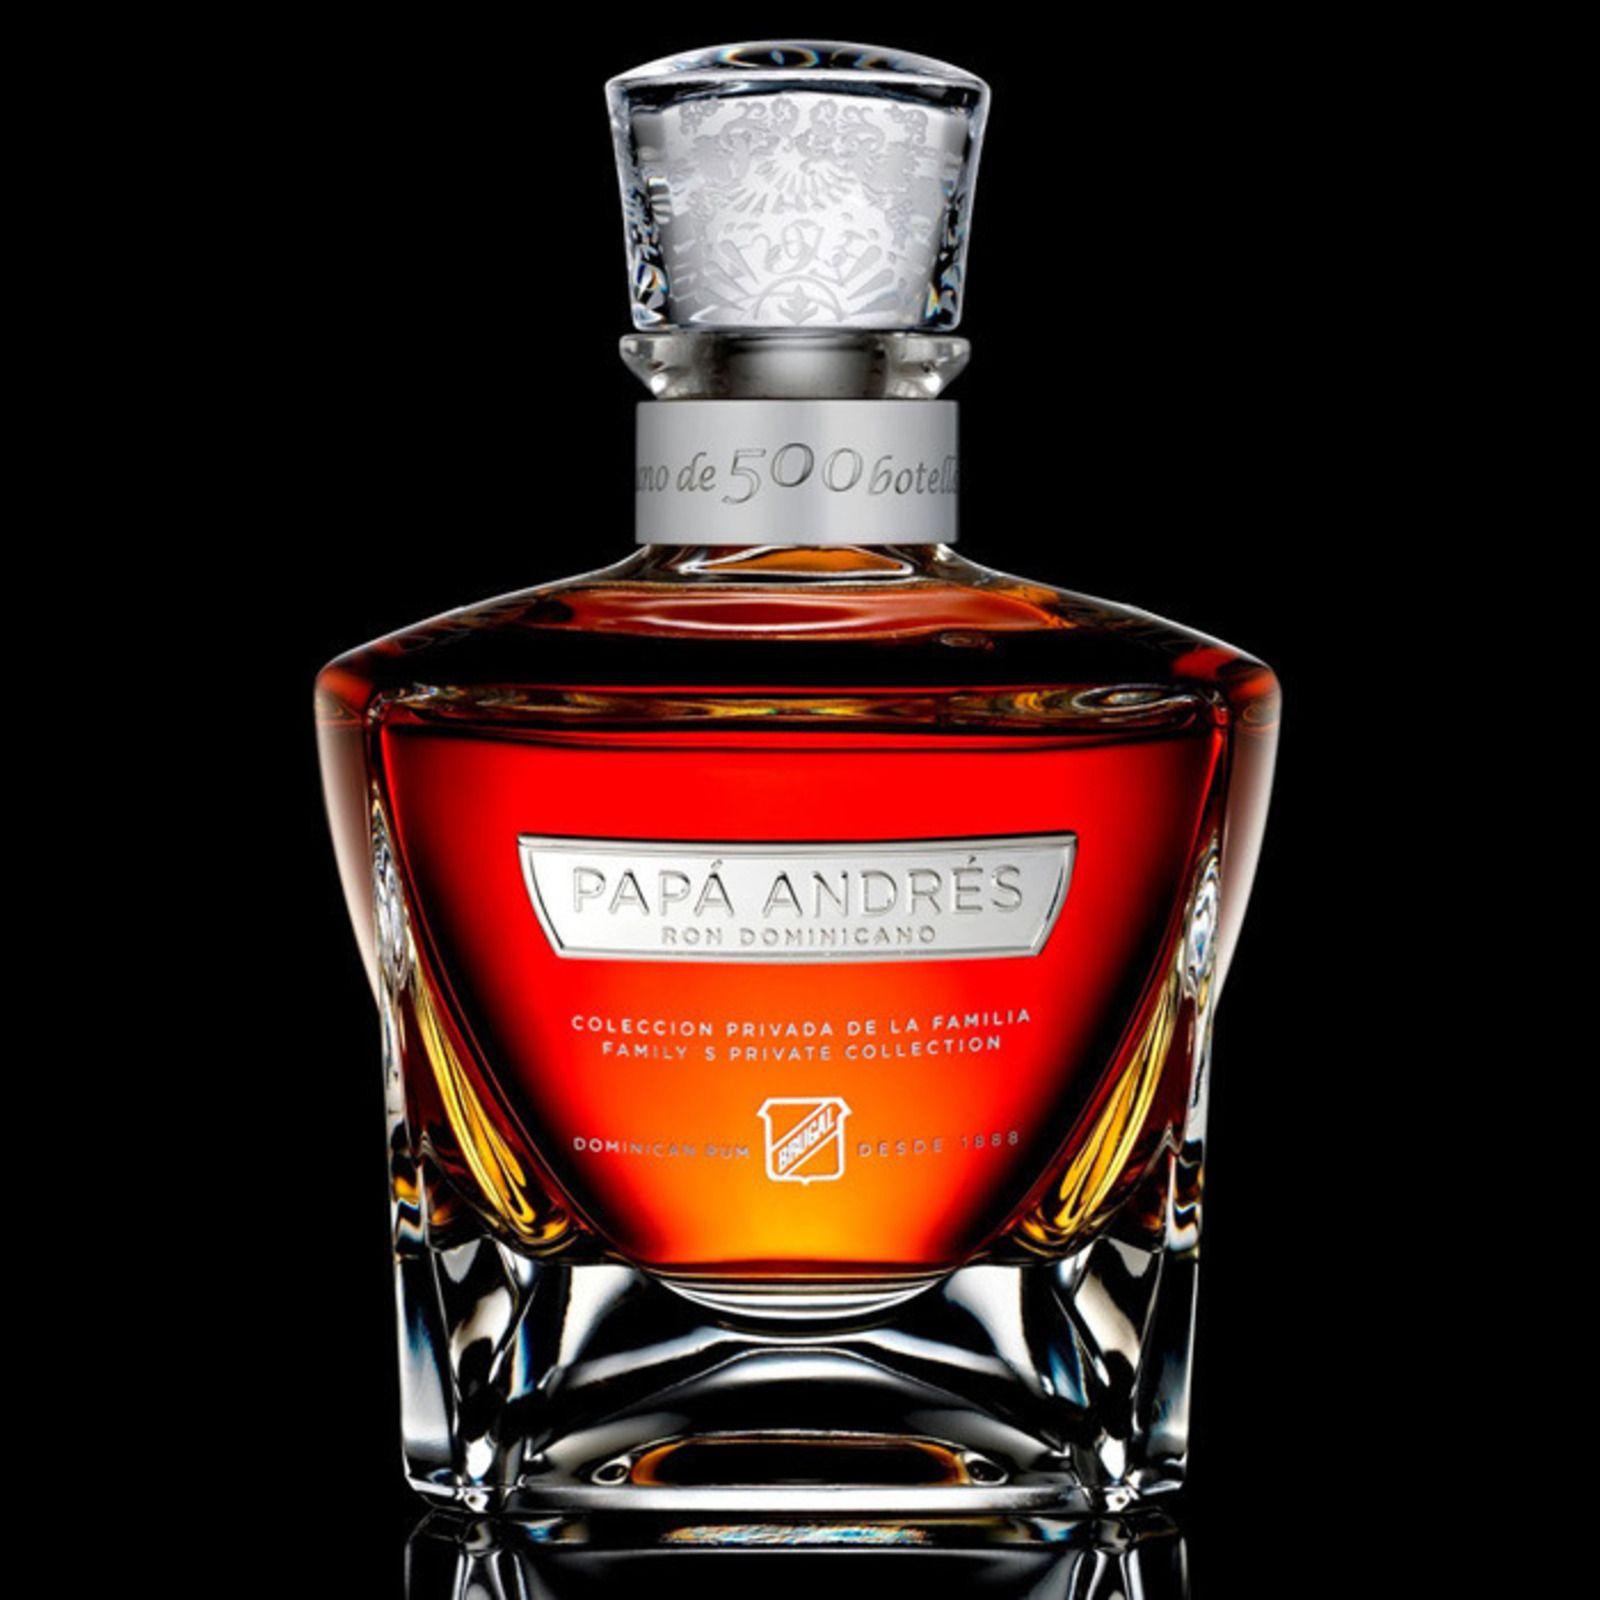 Papa Andres Rum Rum Liquor Bottles